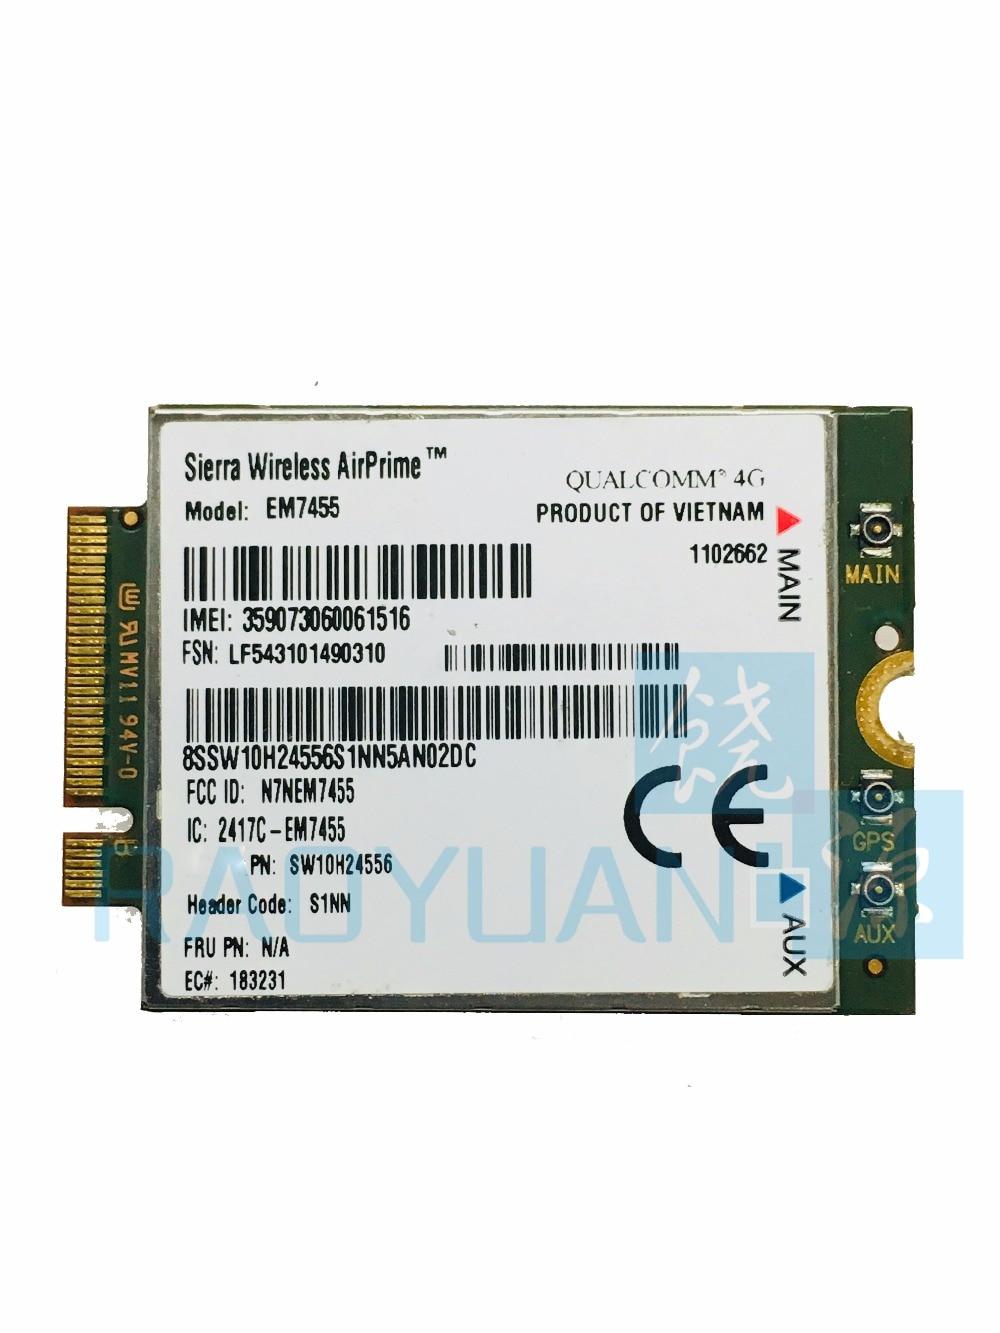 4G LTE WWAN CARD for Sierra Wireless Airprime EM7455 GOBI6000 QUALCOMM FRU:S1NN For Lenovo X270 T470 T470S T470P P51 P71 2017 X1